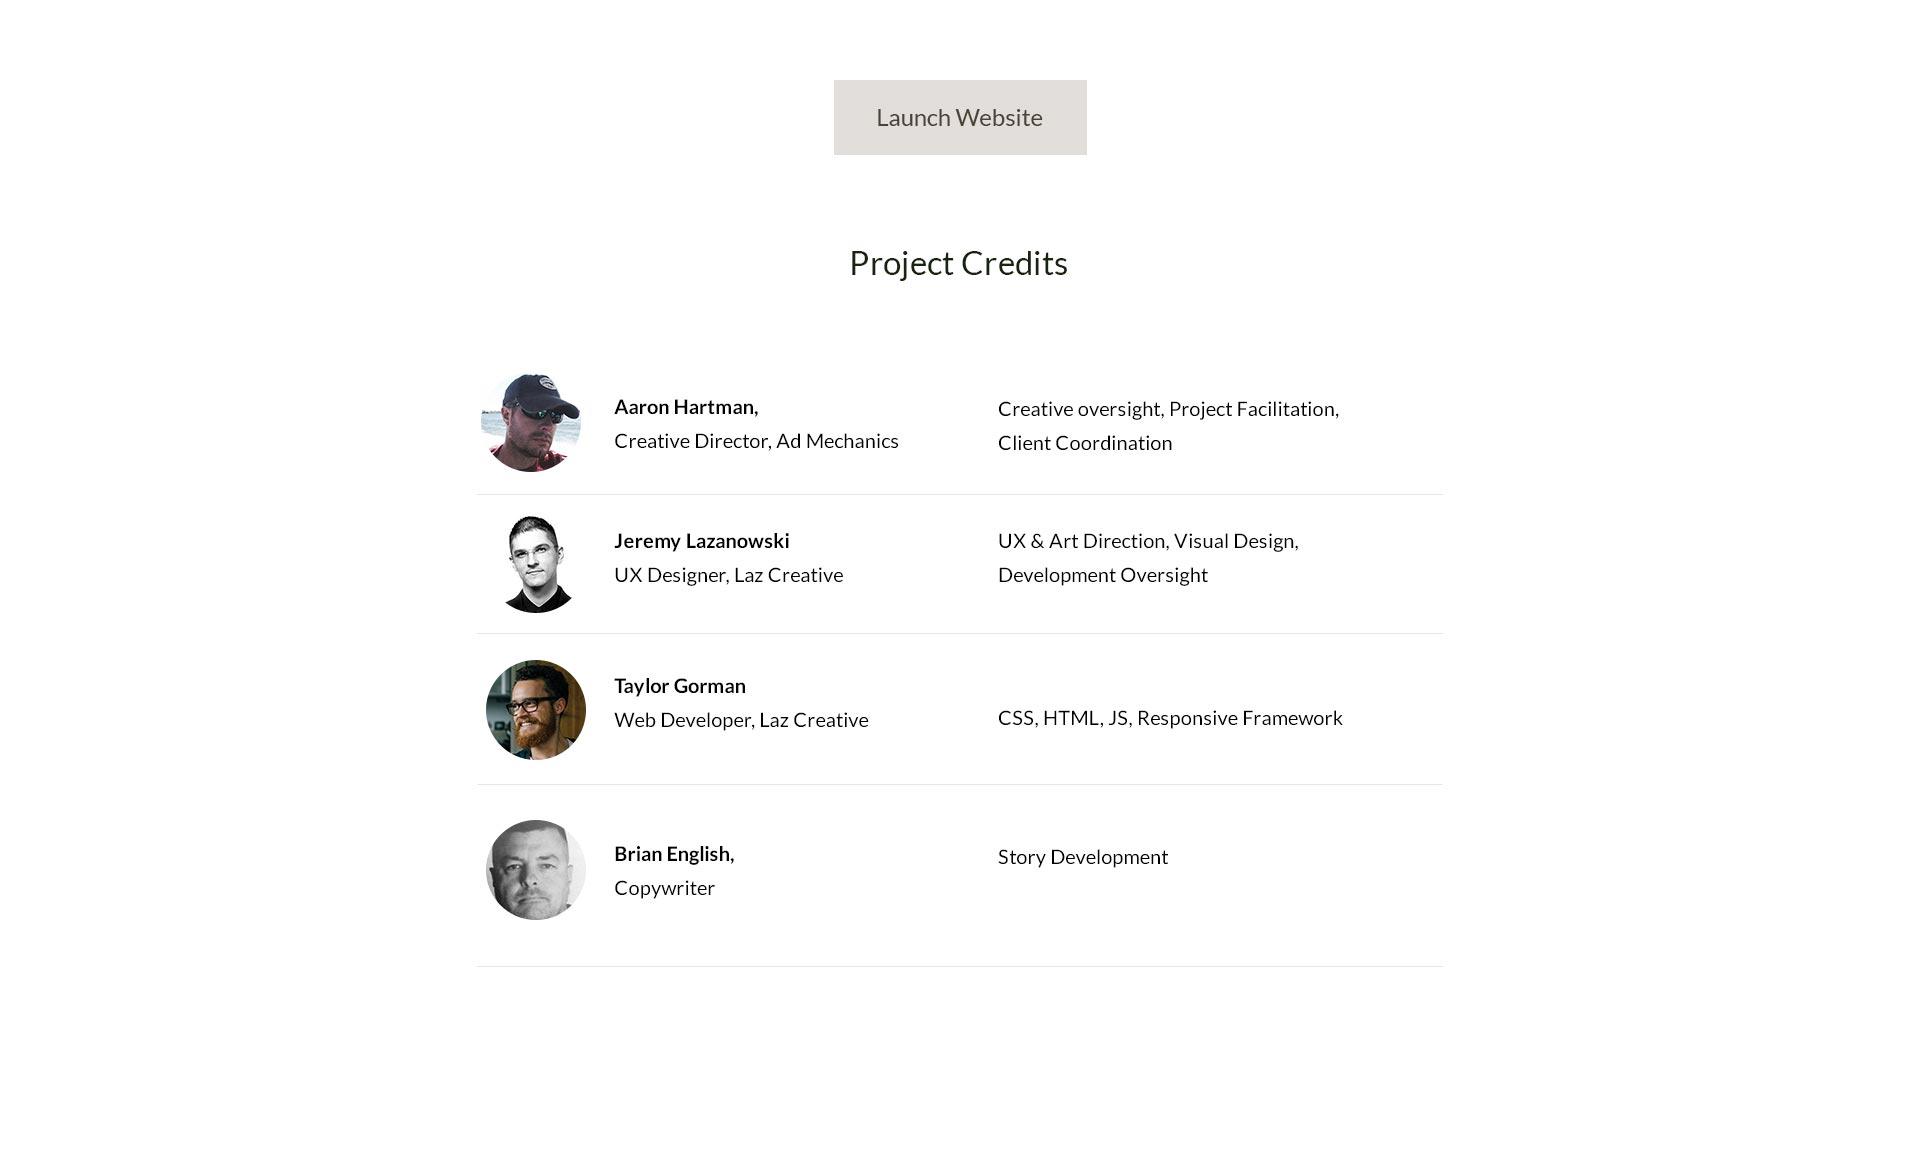 Segassia-Vineyard-Project-Credits